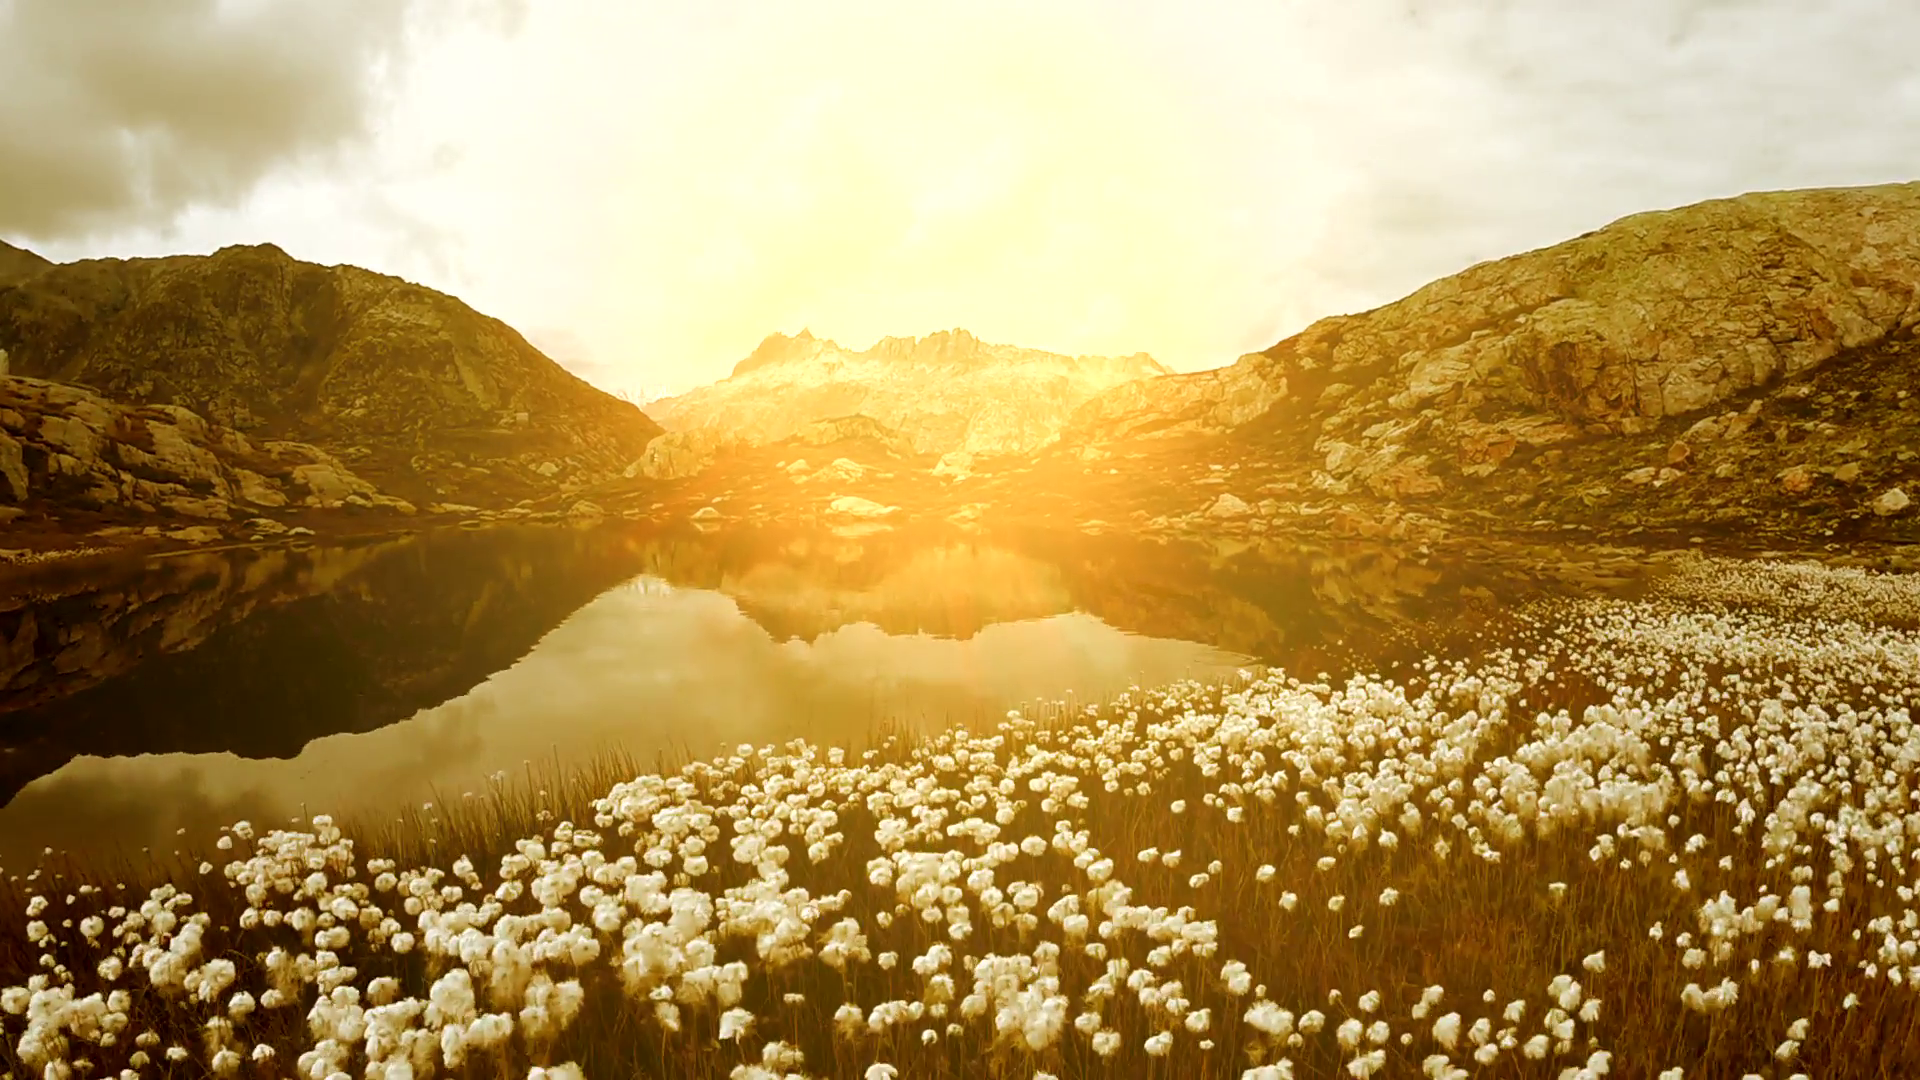 cotton field around mountain lake landscape scenery. peaceful nature ...